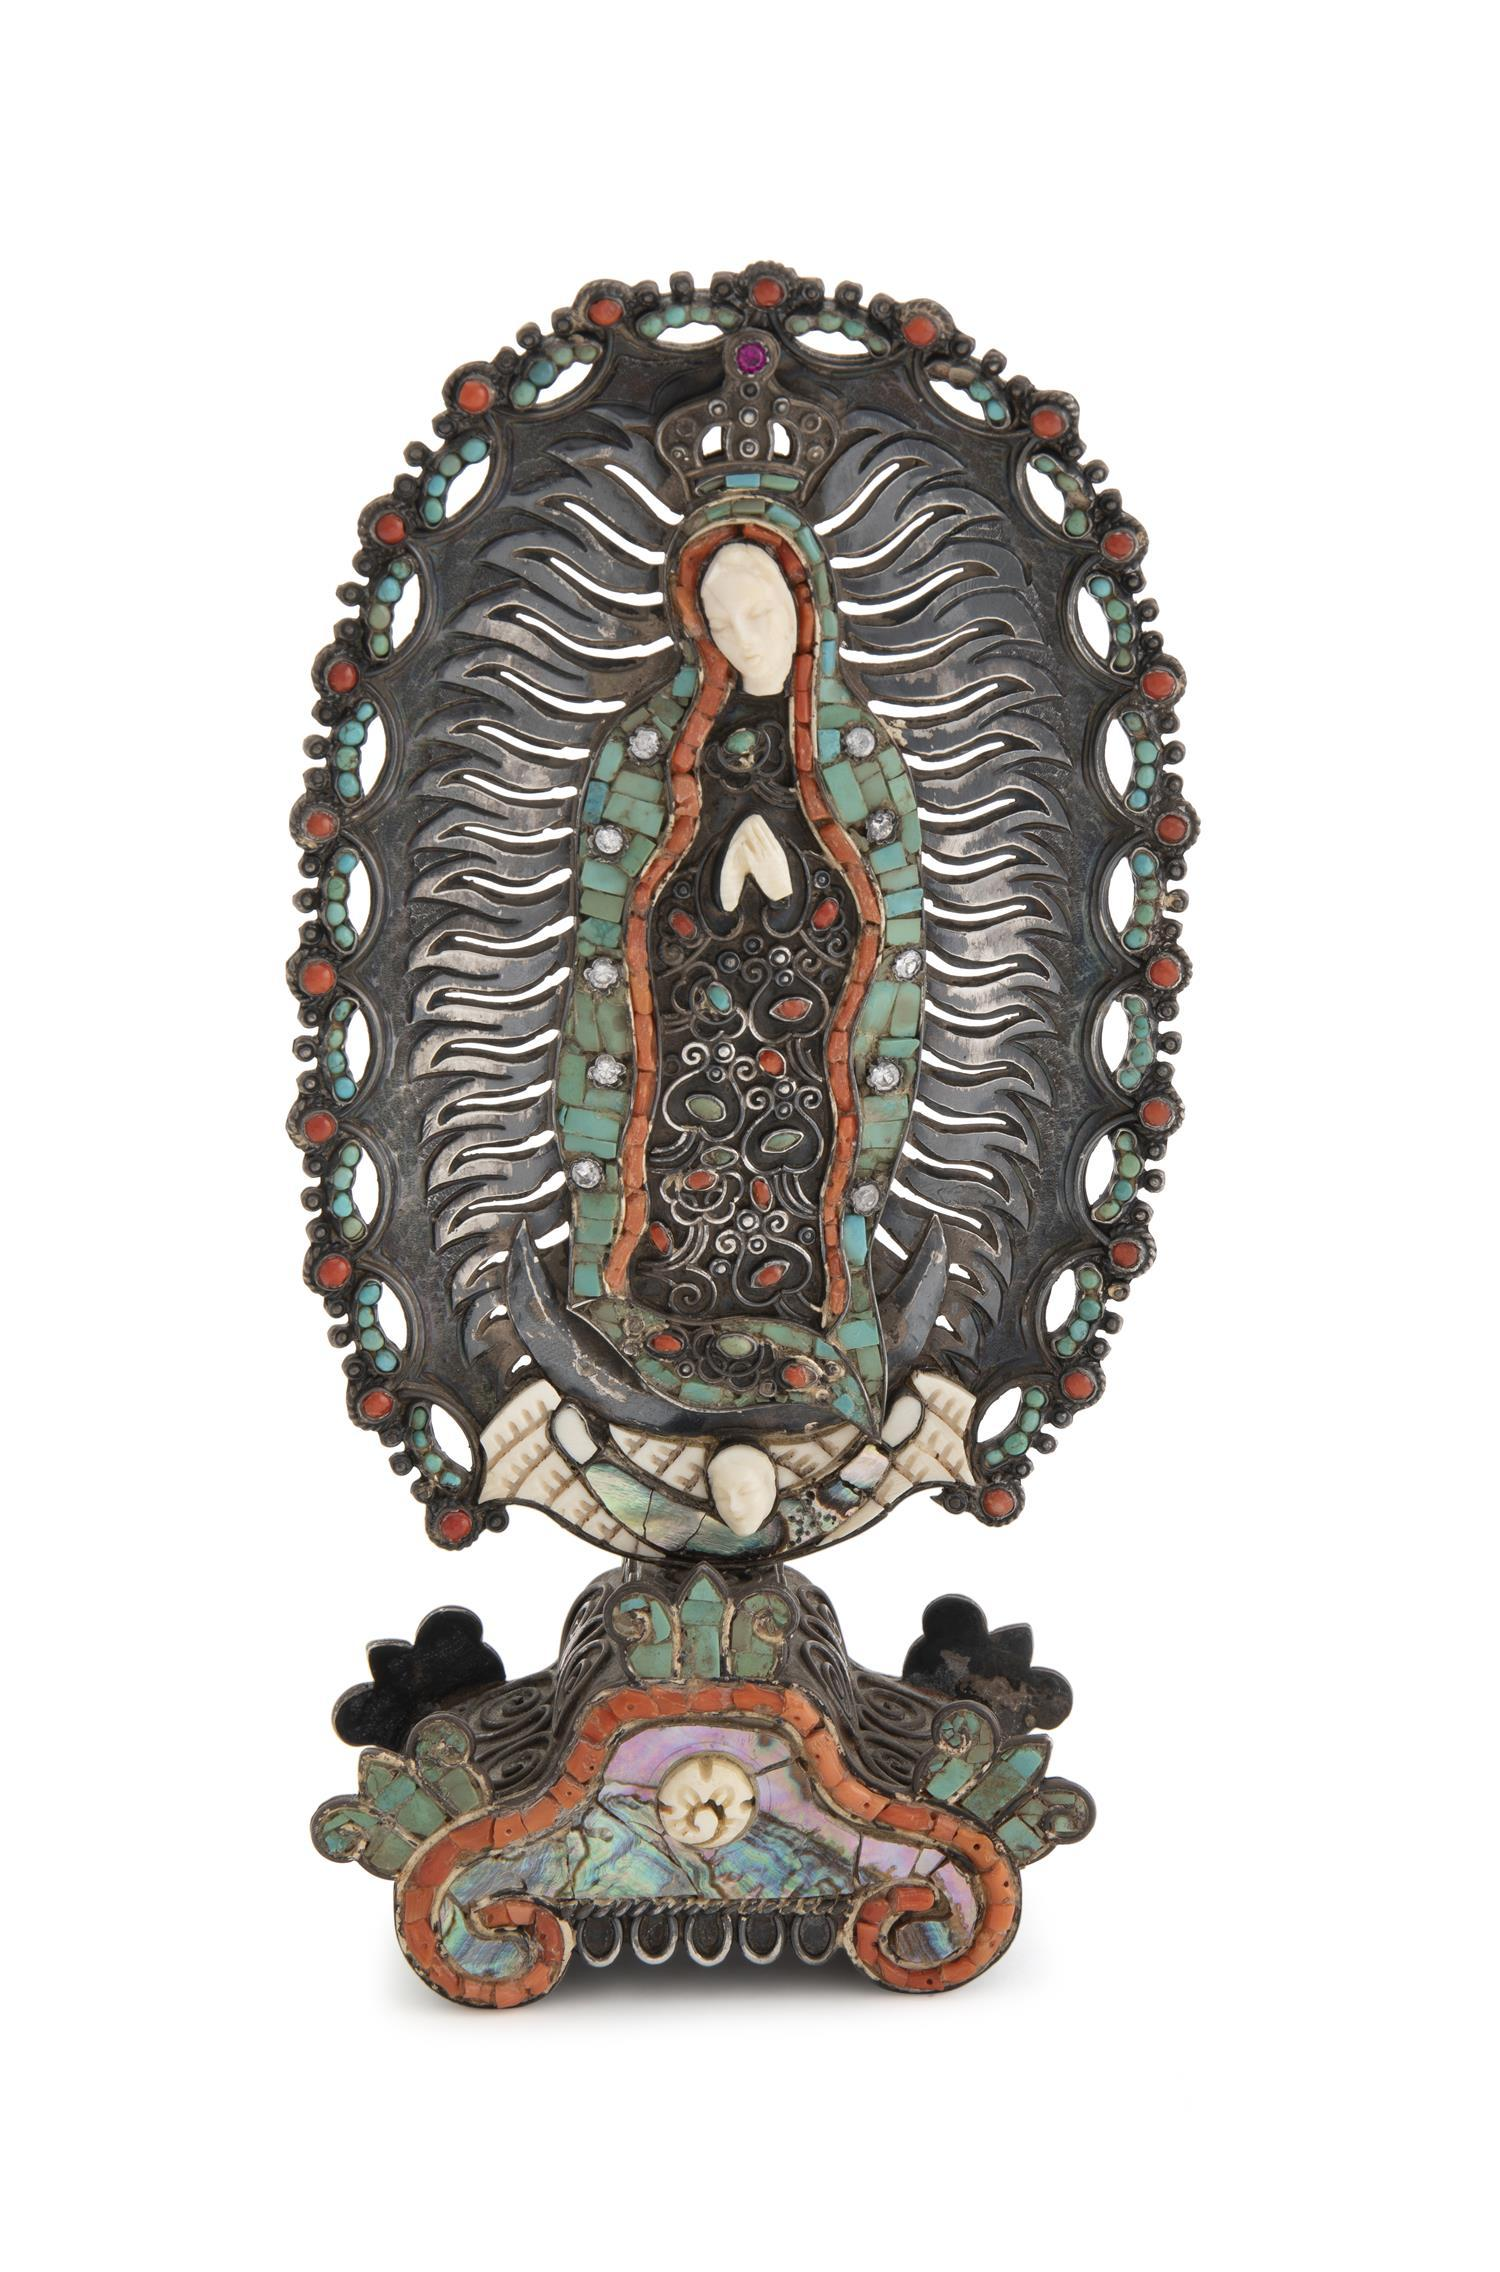 A Matl Virgen de Guadelupe silver santos figure